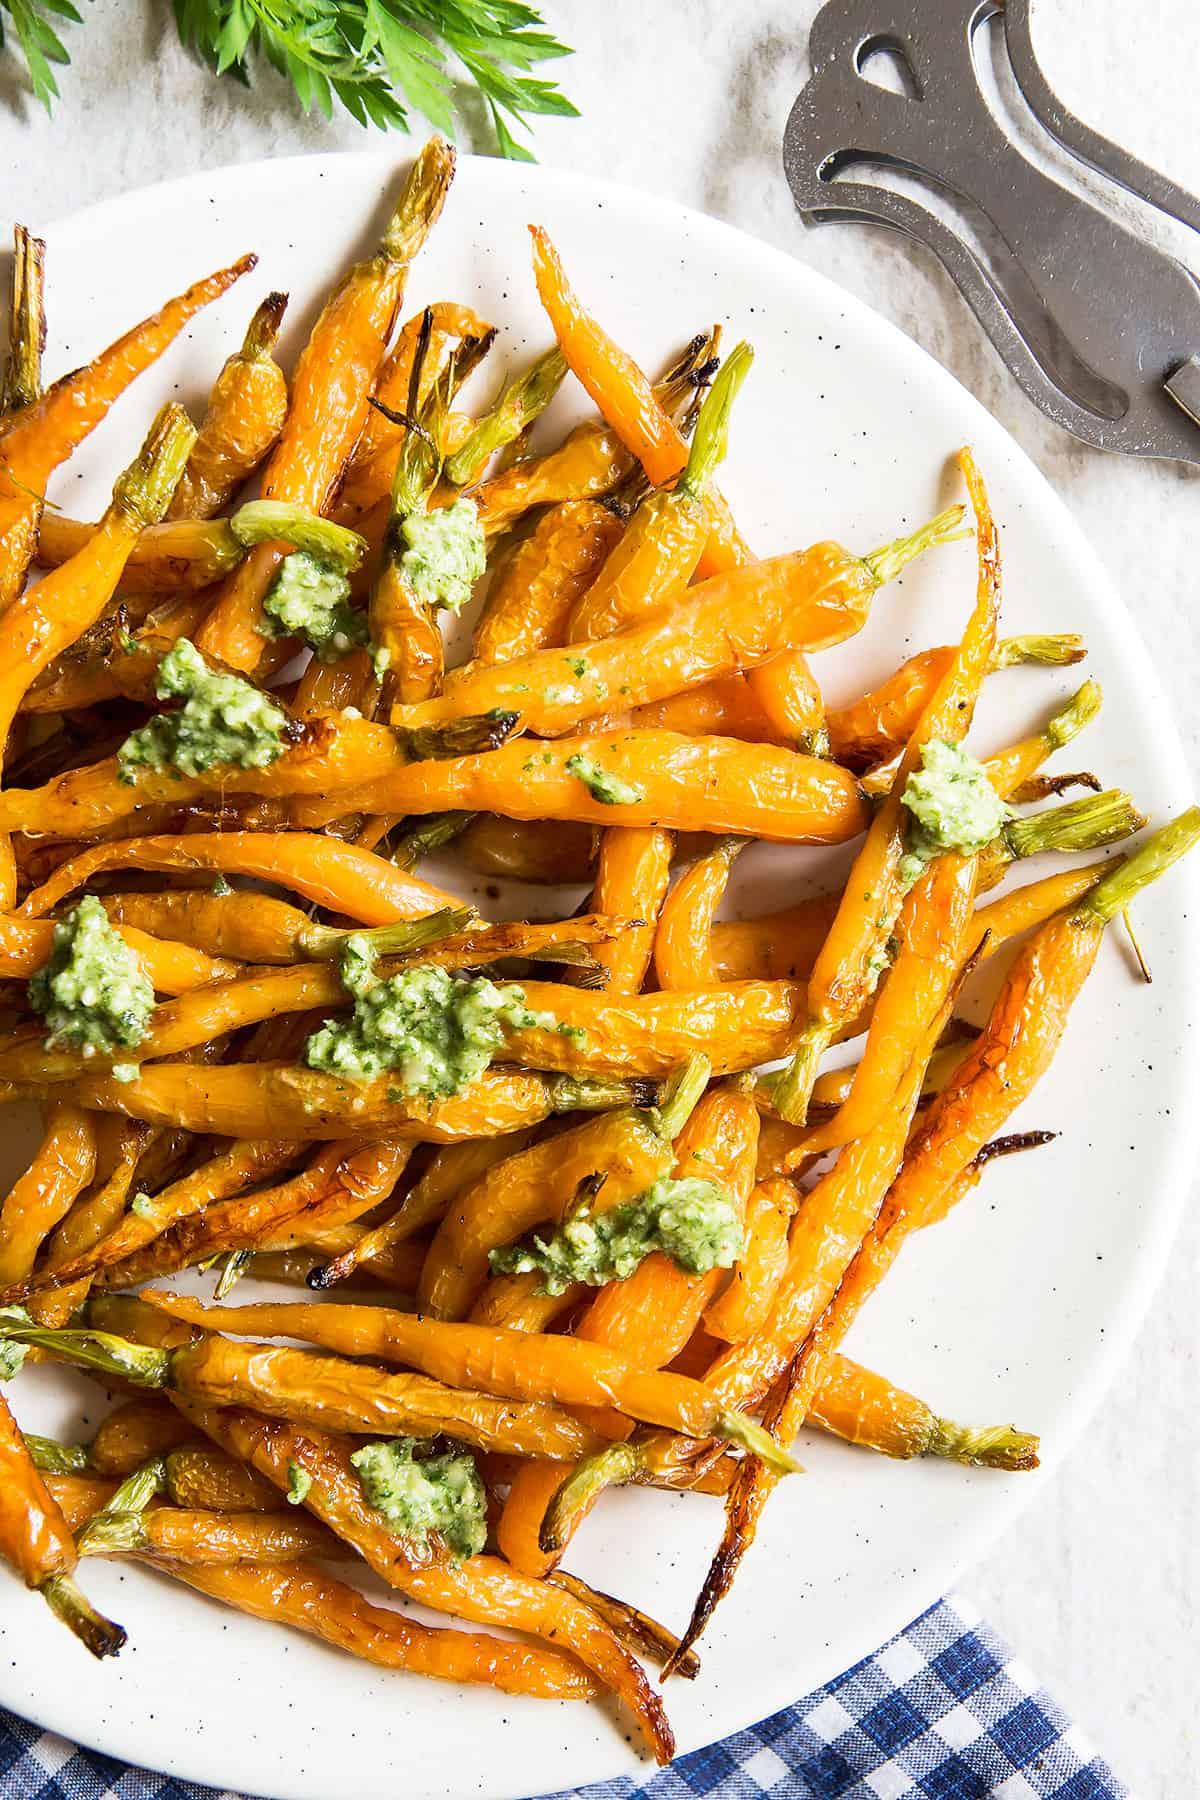 Roasted Carrots with Creamy Pesto